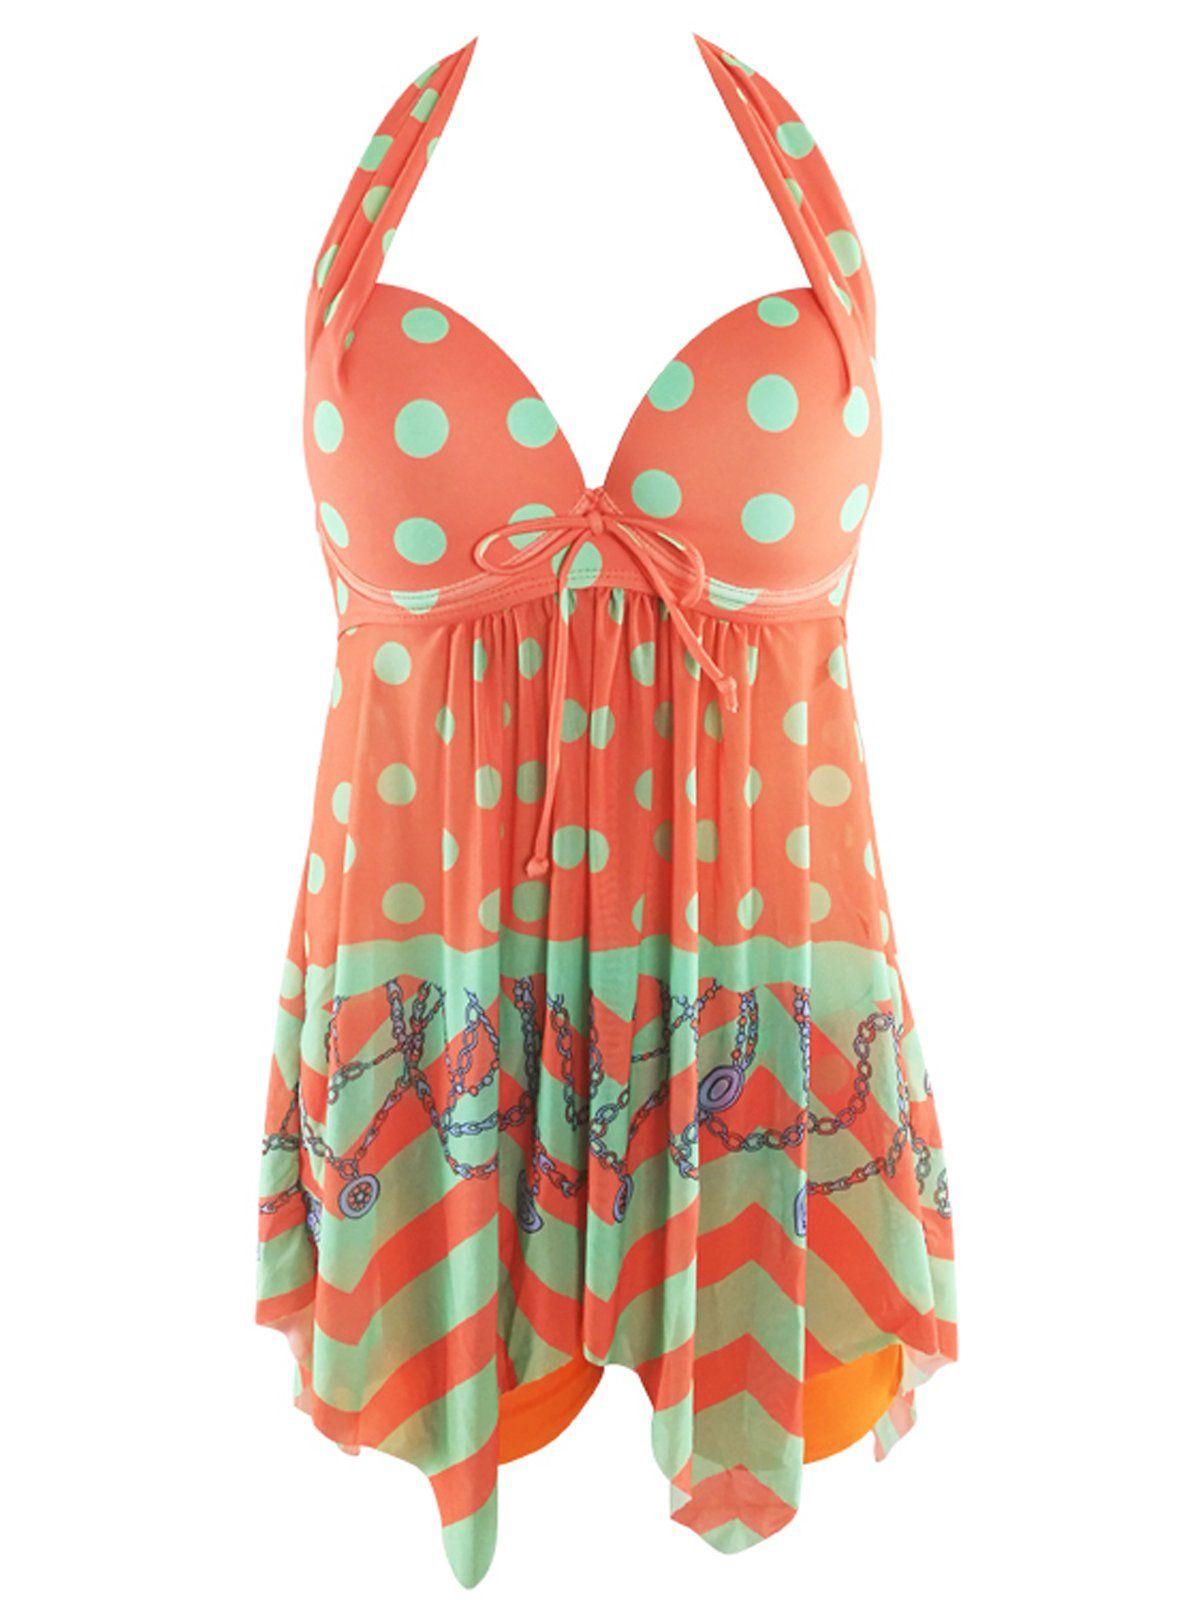 ba83990b2e34e Maternity Styles - Zando Womens Skirted Tummy Control Tankini Swimdress Two  Piece Printed Swimsuit with Boyshorts Slimming Swimwear Patchwork Orange  Large ...